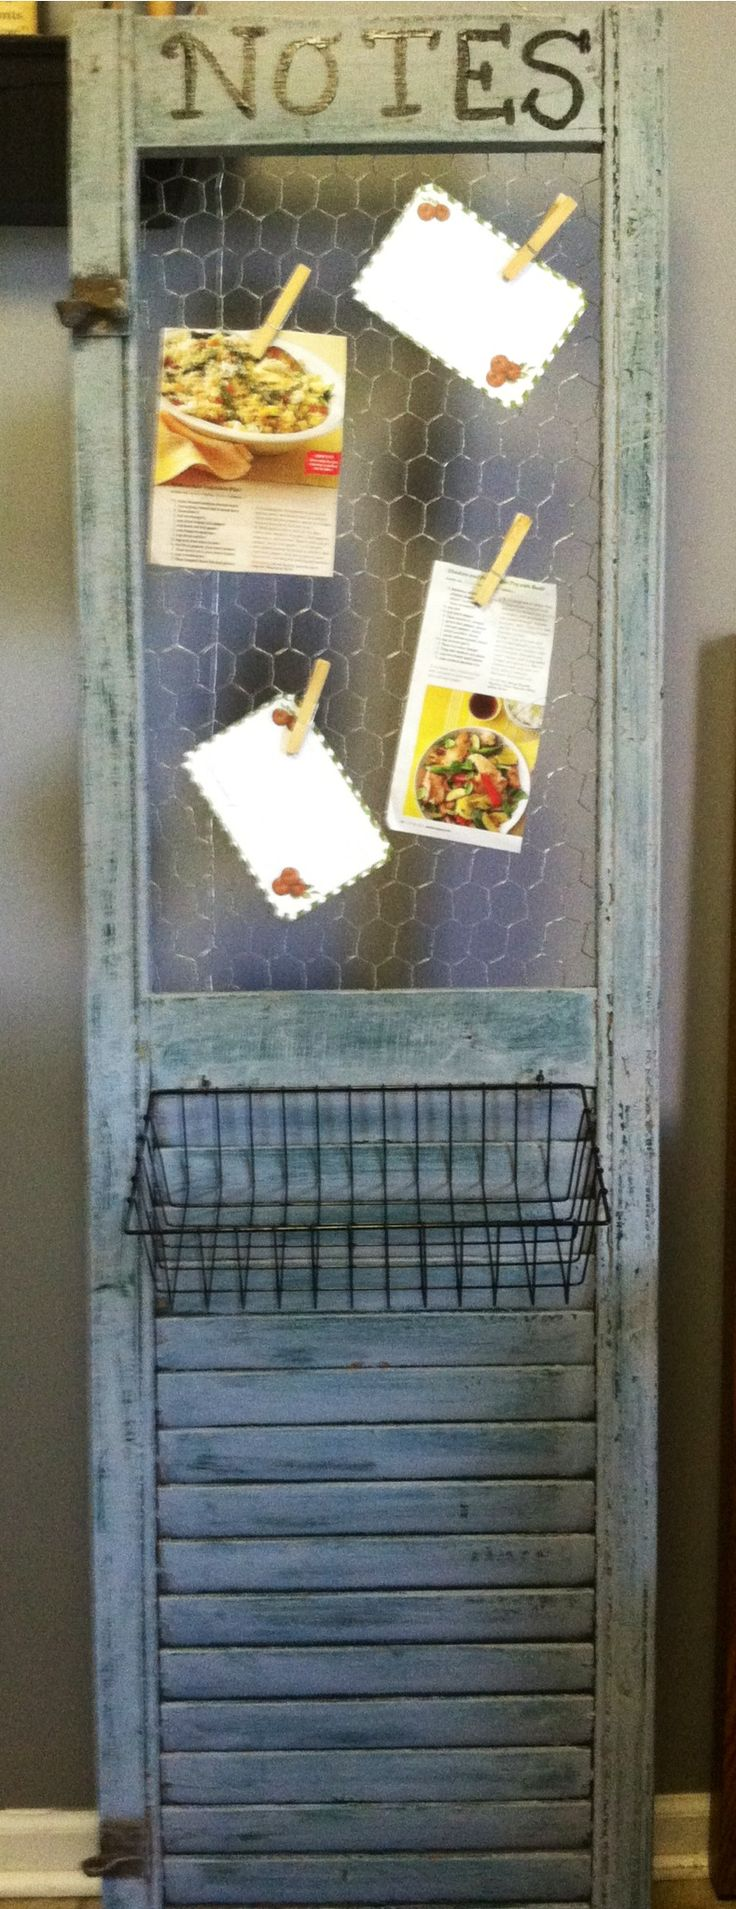 Repurposed shutter into recipe holder/notes